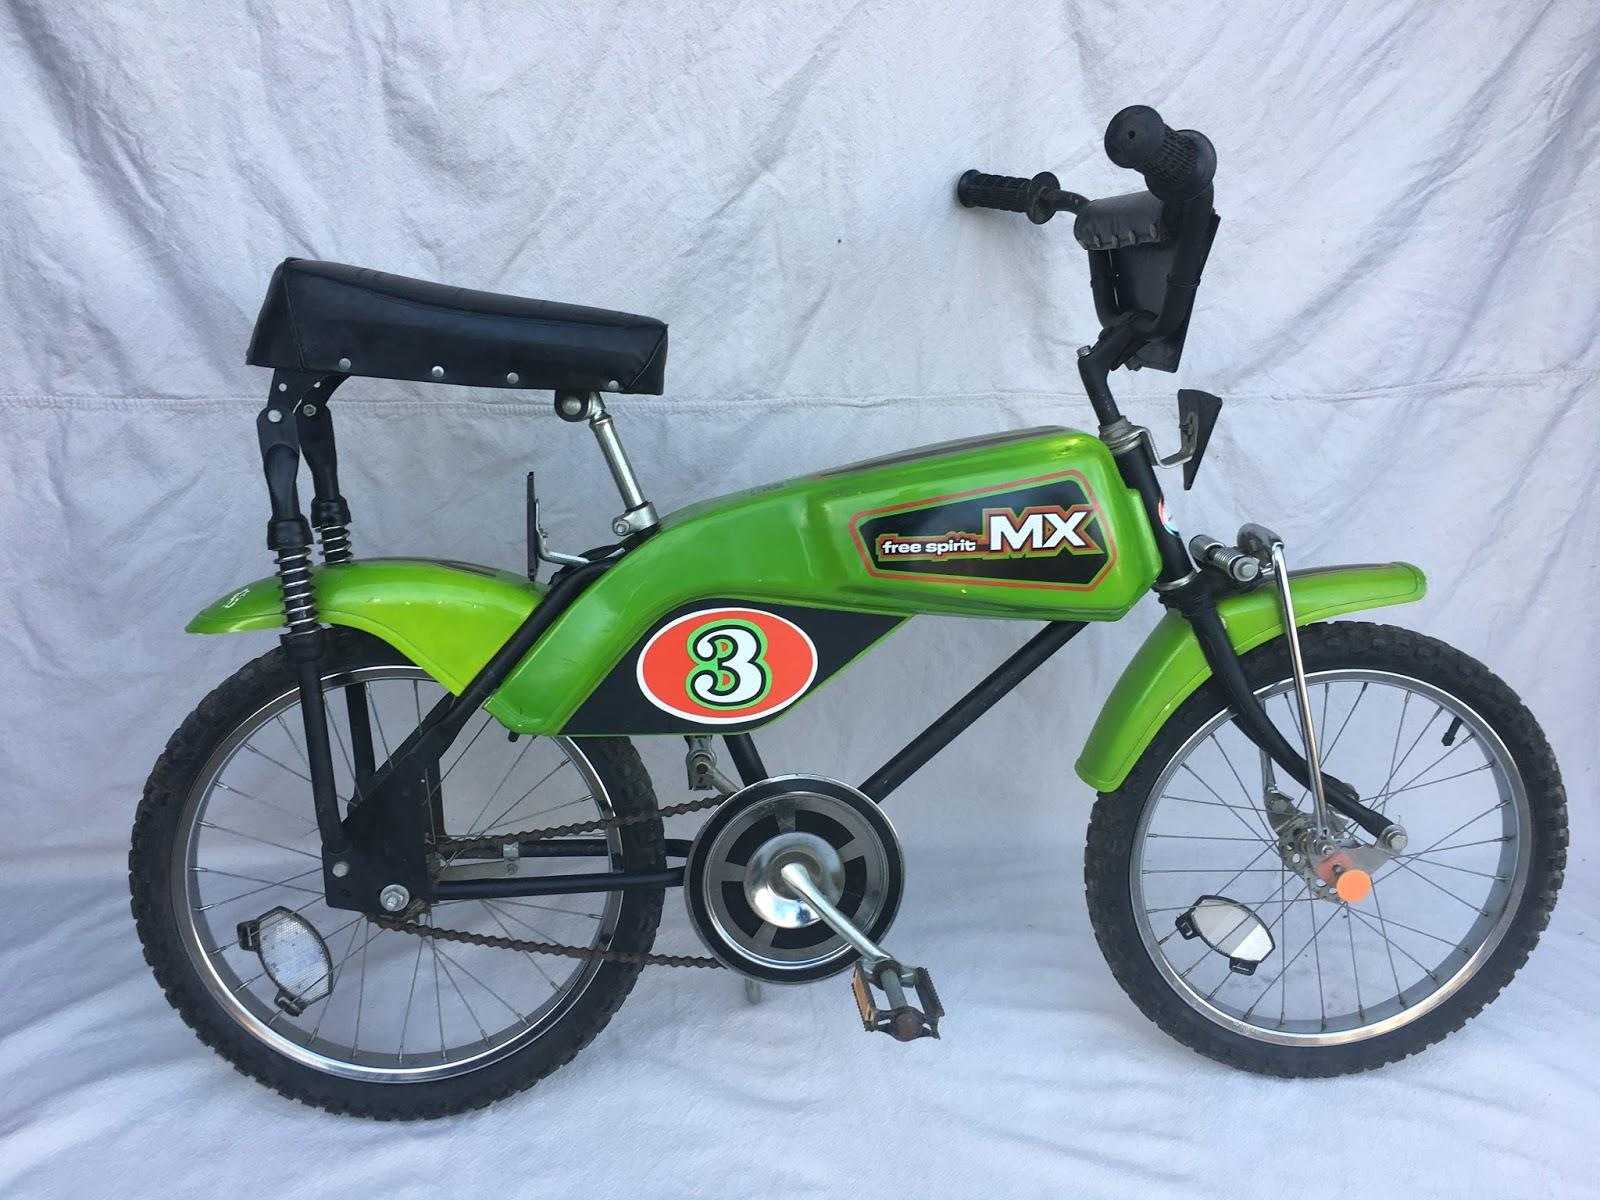 1976 sears free spirit mx no 3 green old school bmx bike sold 1976 sears free spirit mx no 3 green old school bmx bike sold sciox Gallery